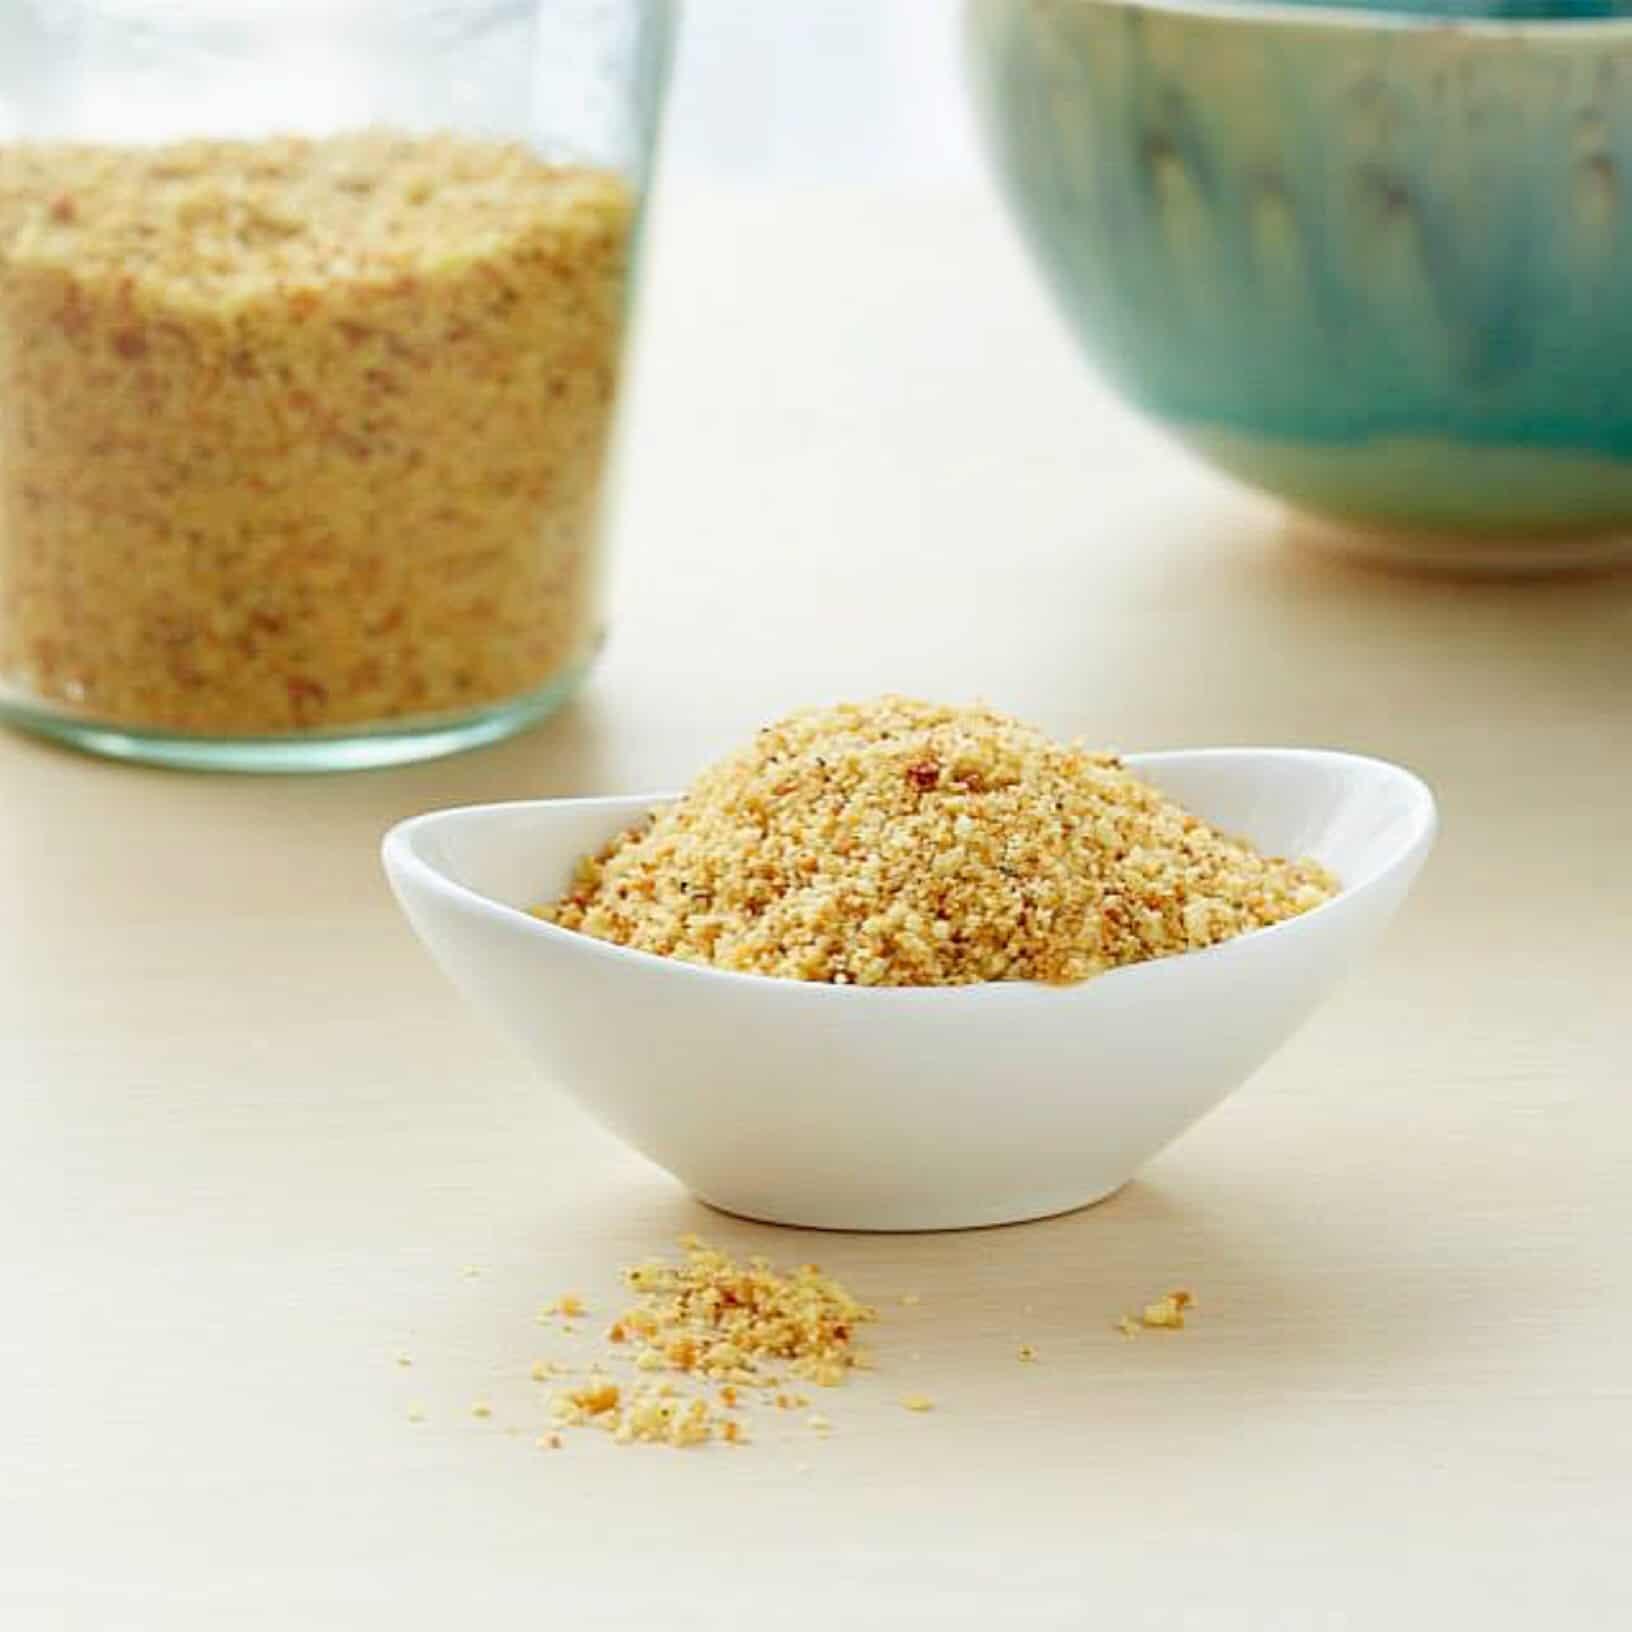 Grain-Free Bread Crumbs